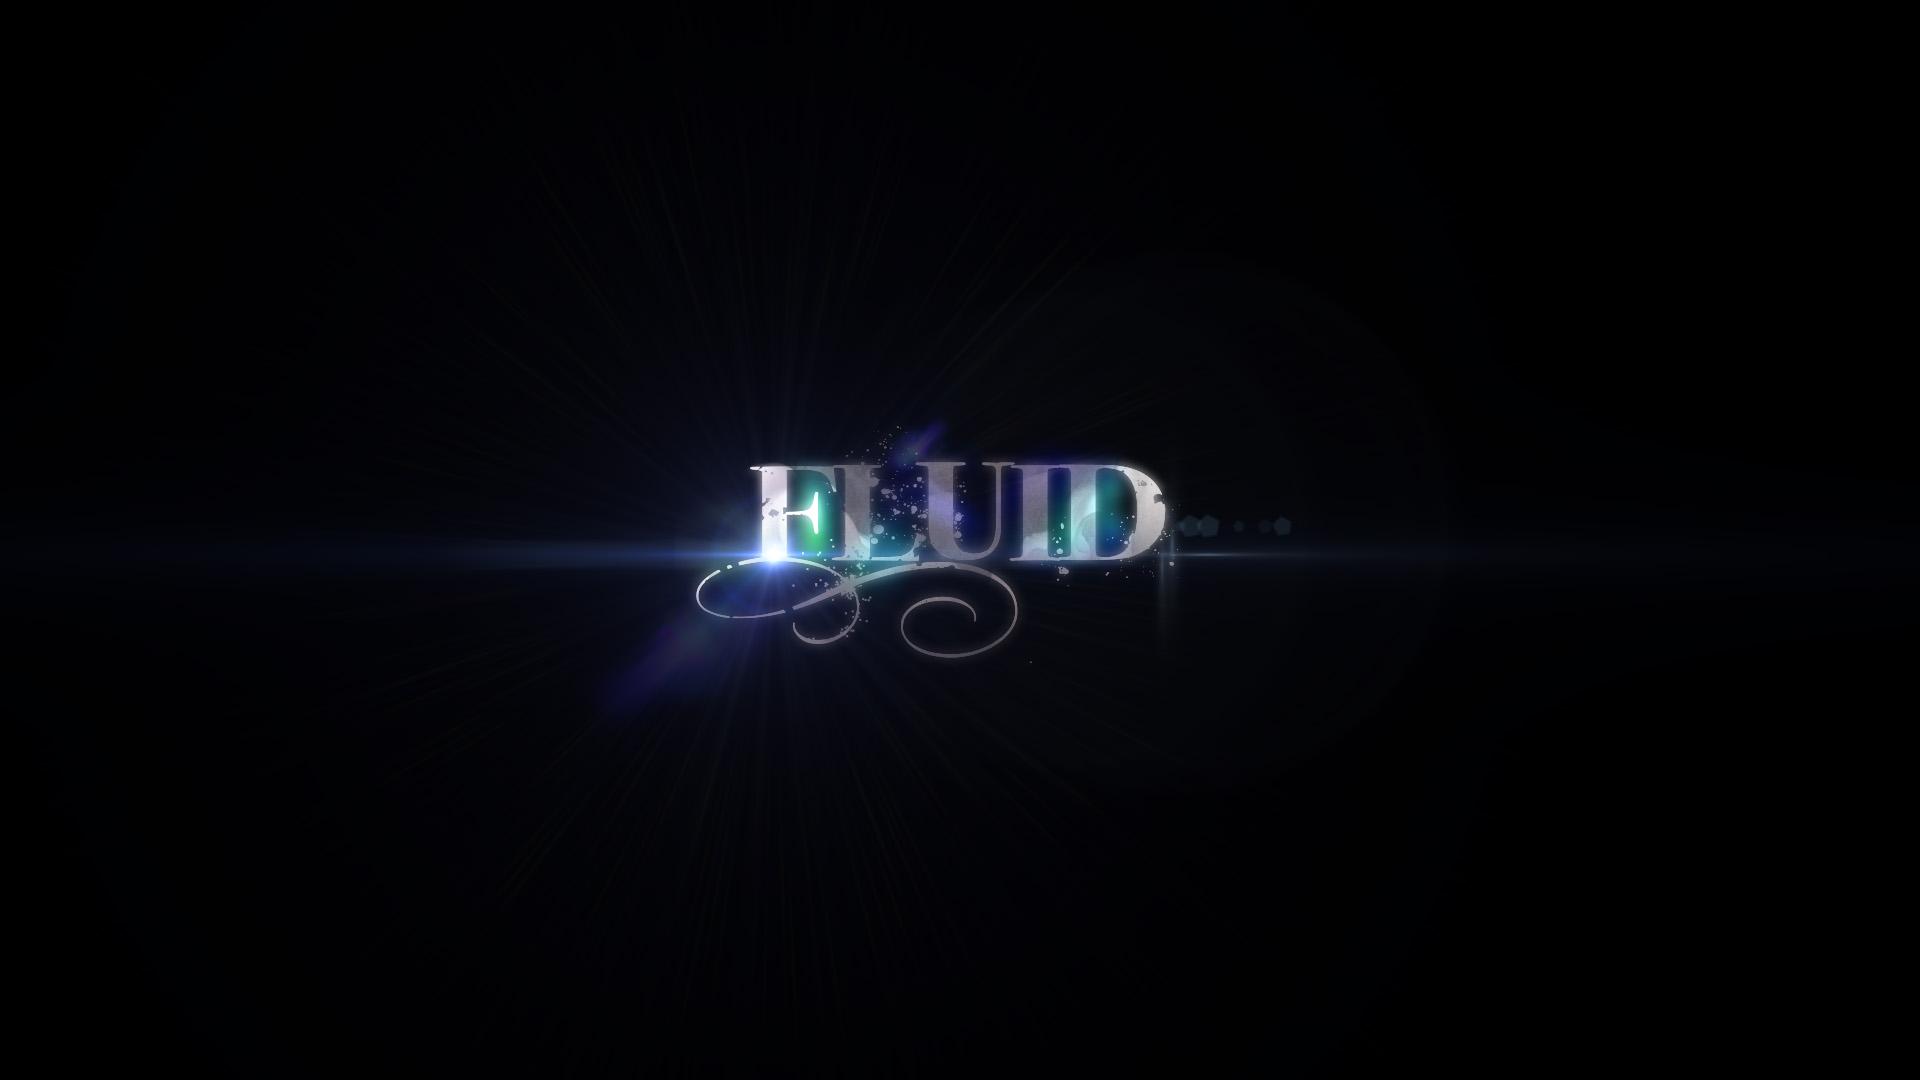 fluid_image01